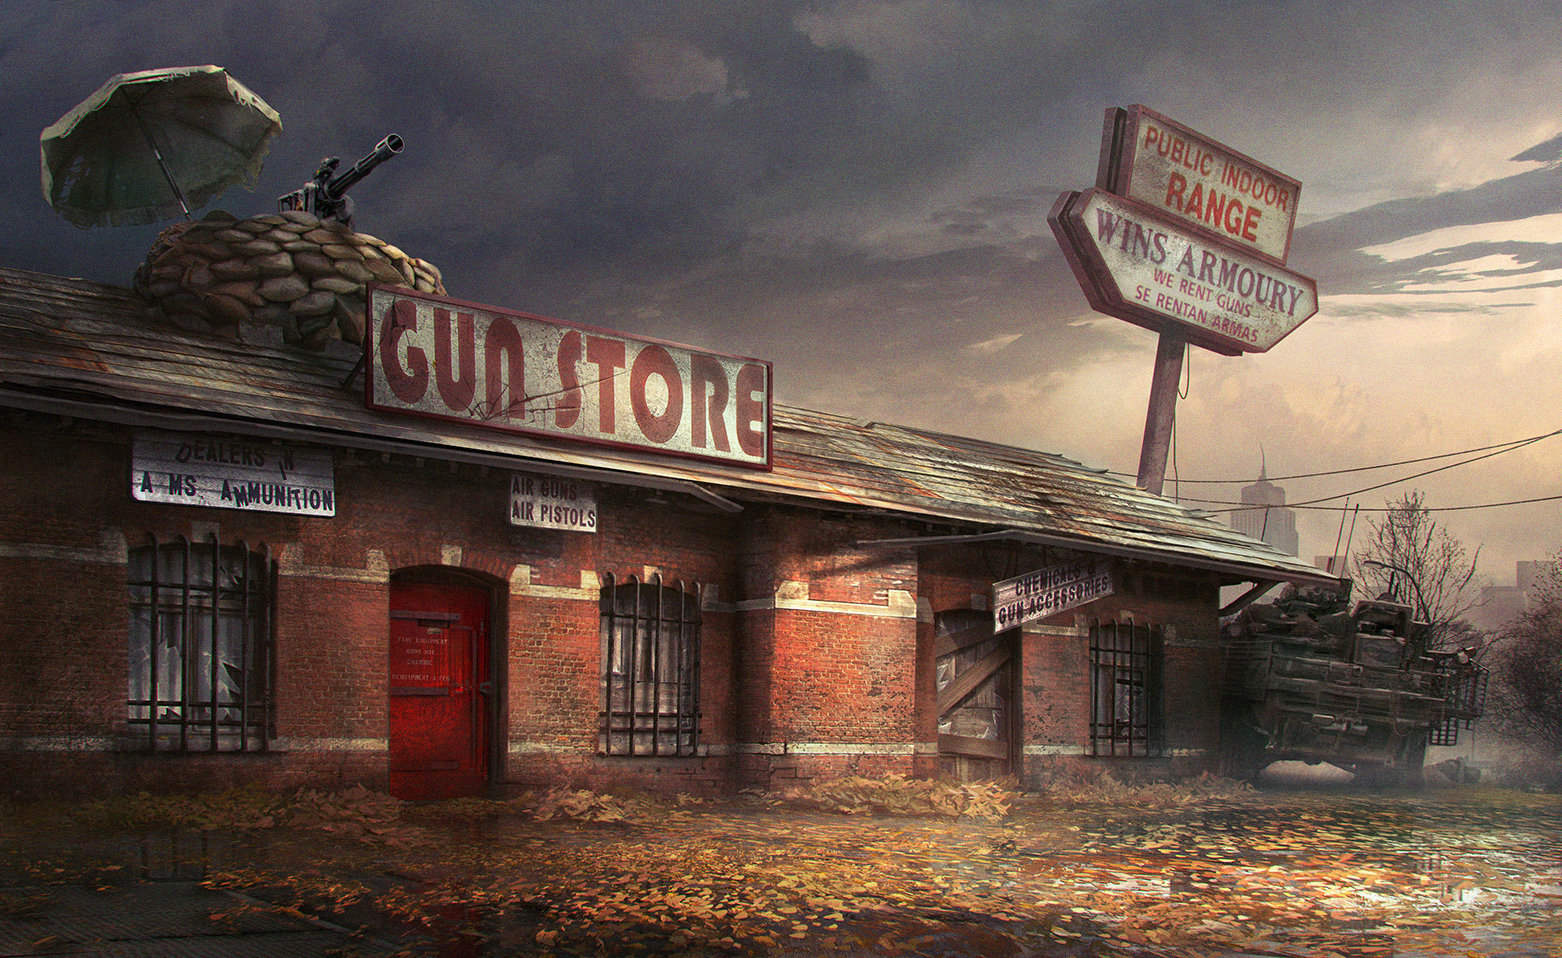 Roberto robert gunstore